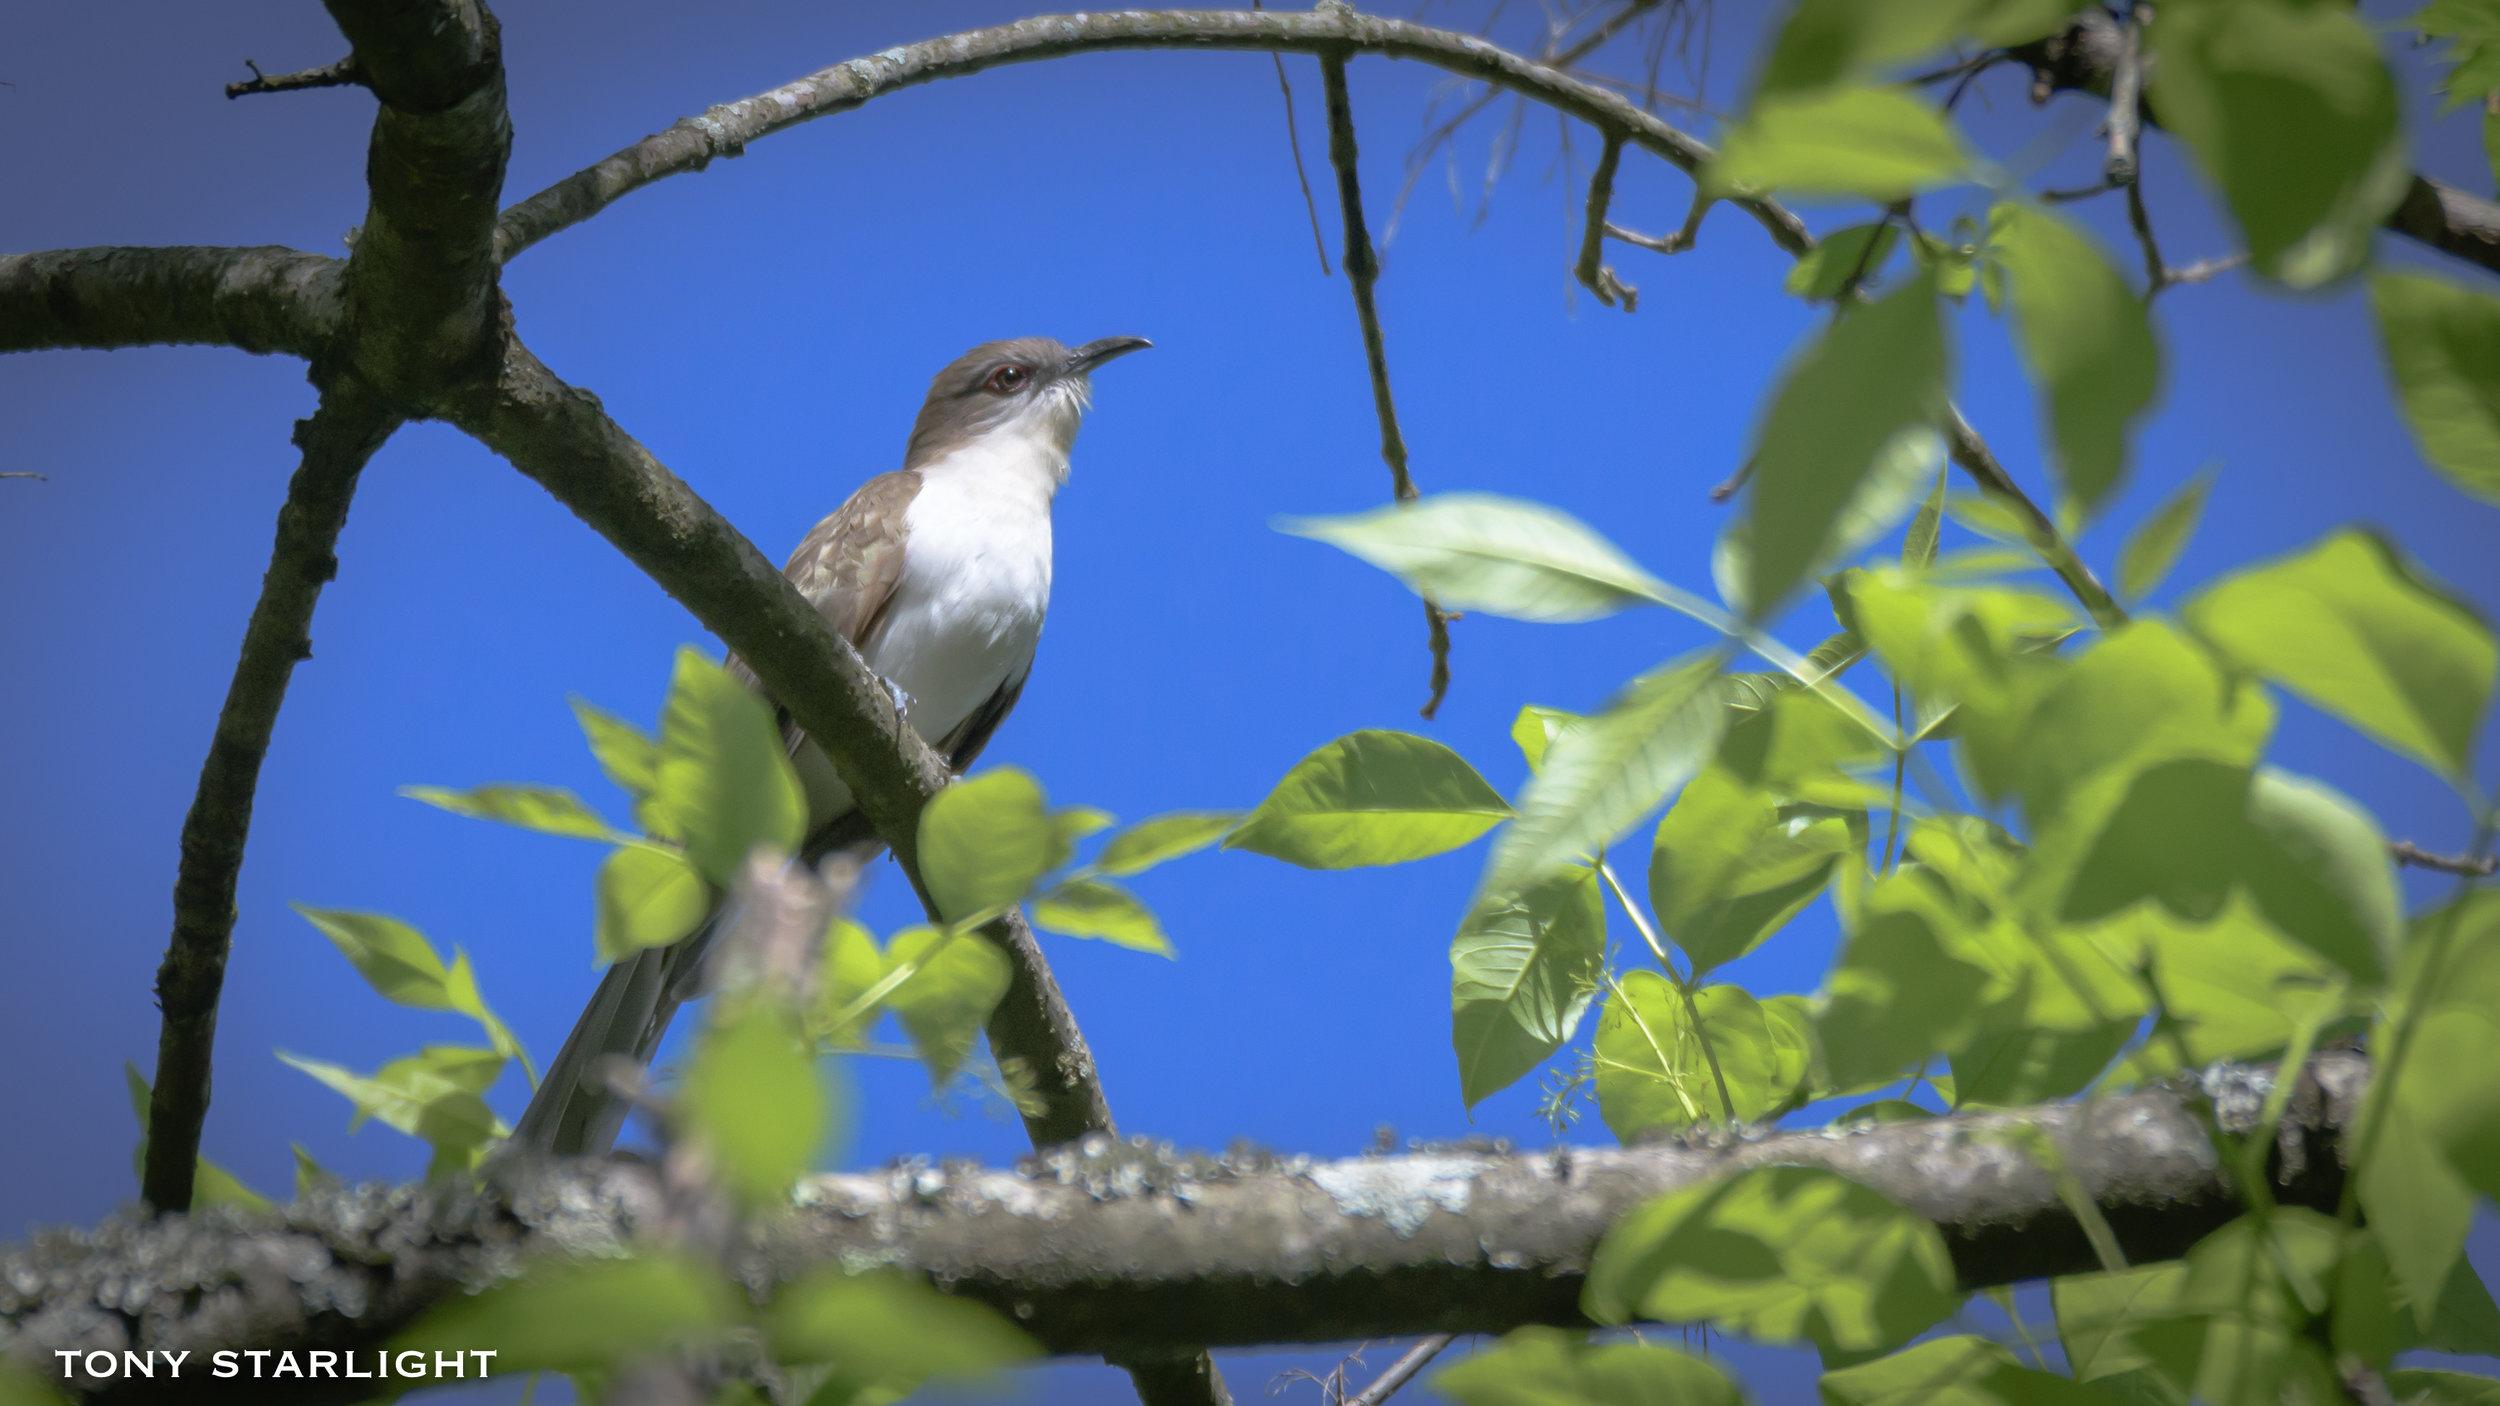 284) Black-billed Cuckoo - May 1, 2018Durham, North Carolina